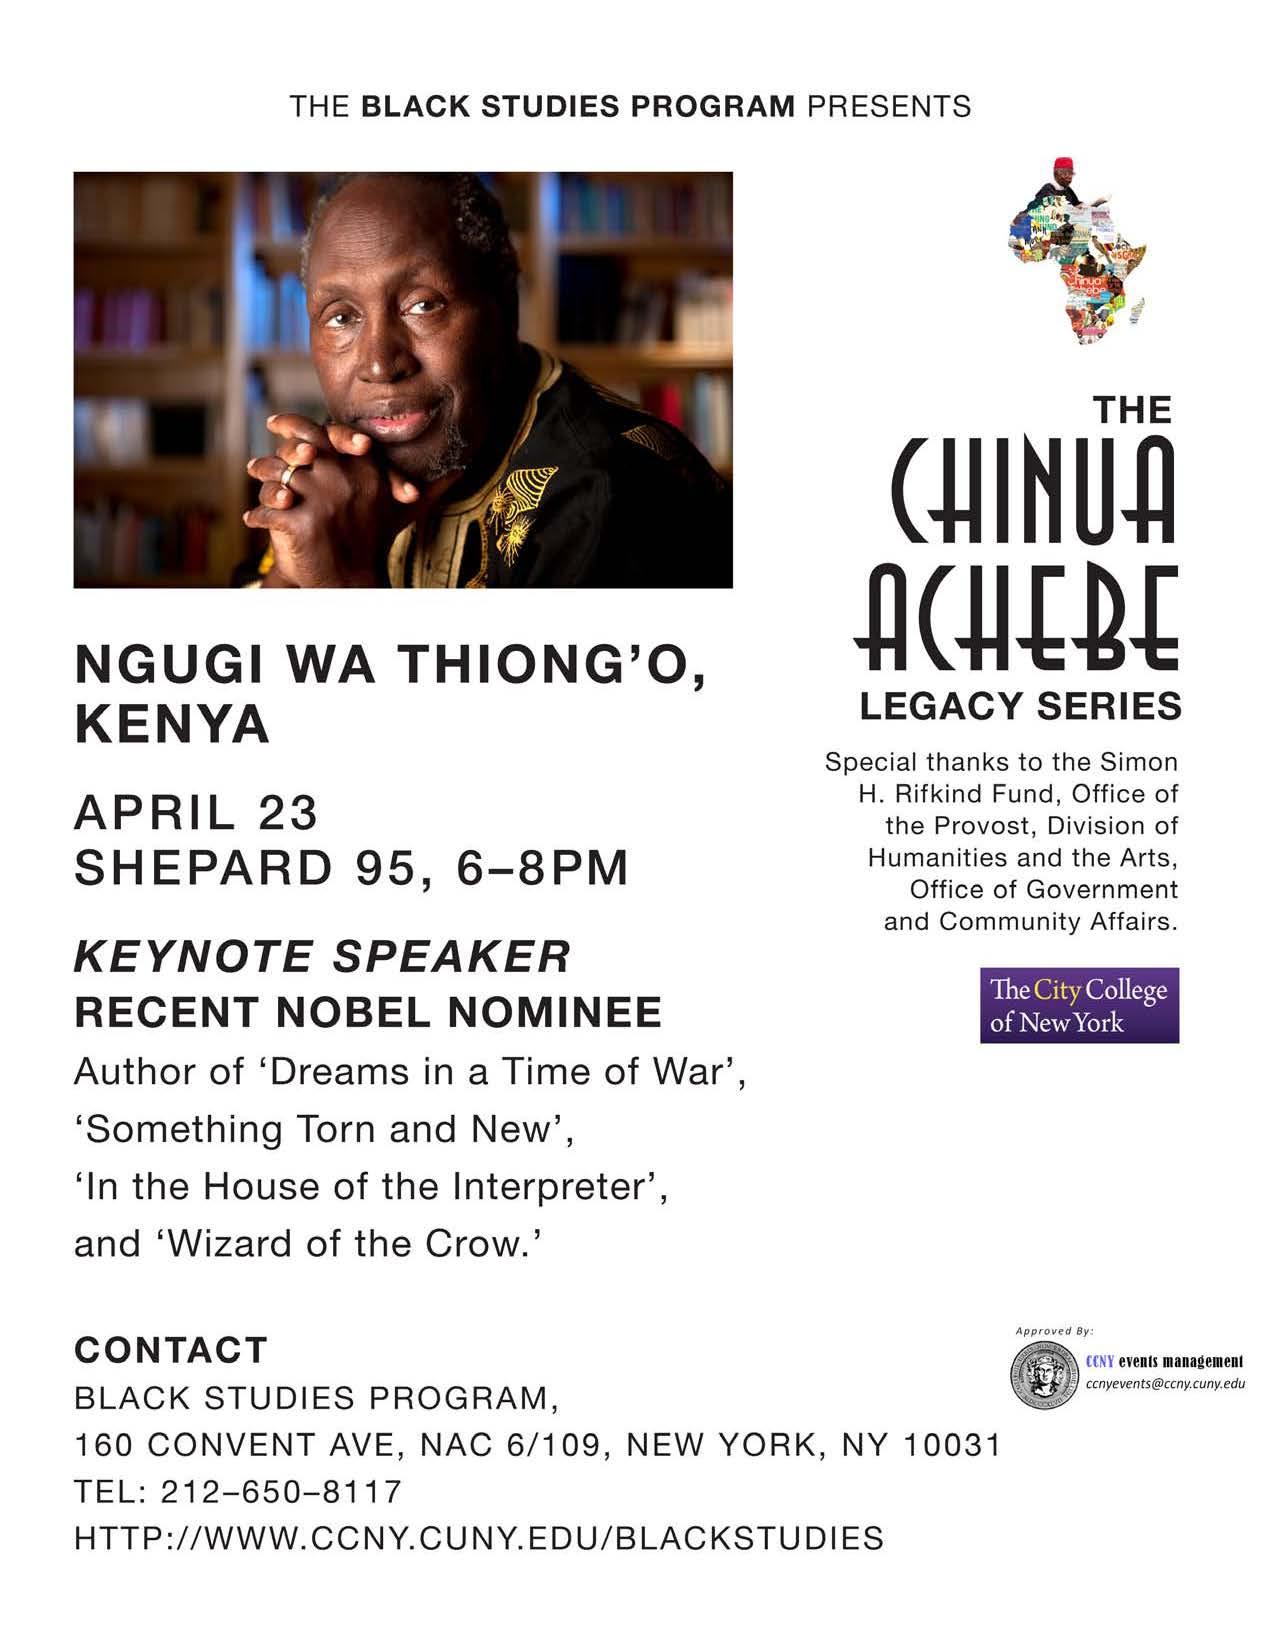 NGUGI WA THIONG'O KENYA SPEAKS APRIL 23 2017. SHEPARD ROOM 95, 6PM-9PM